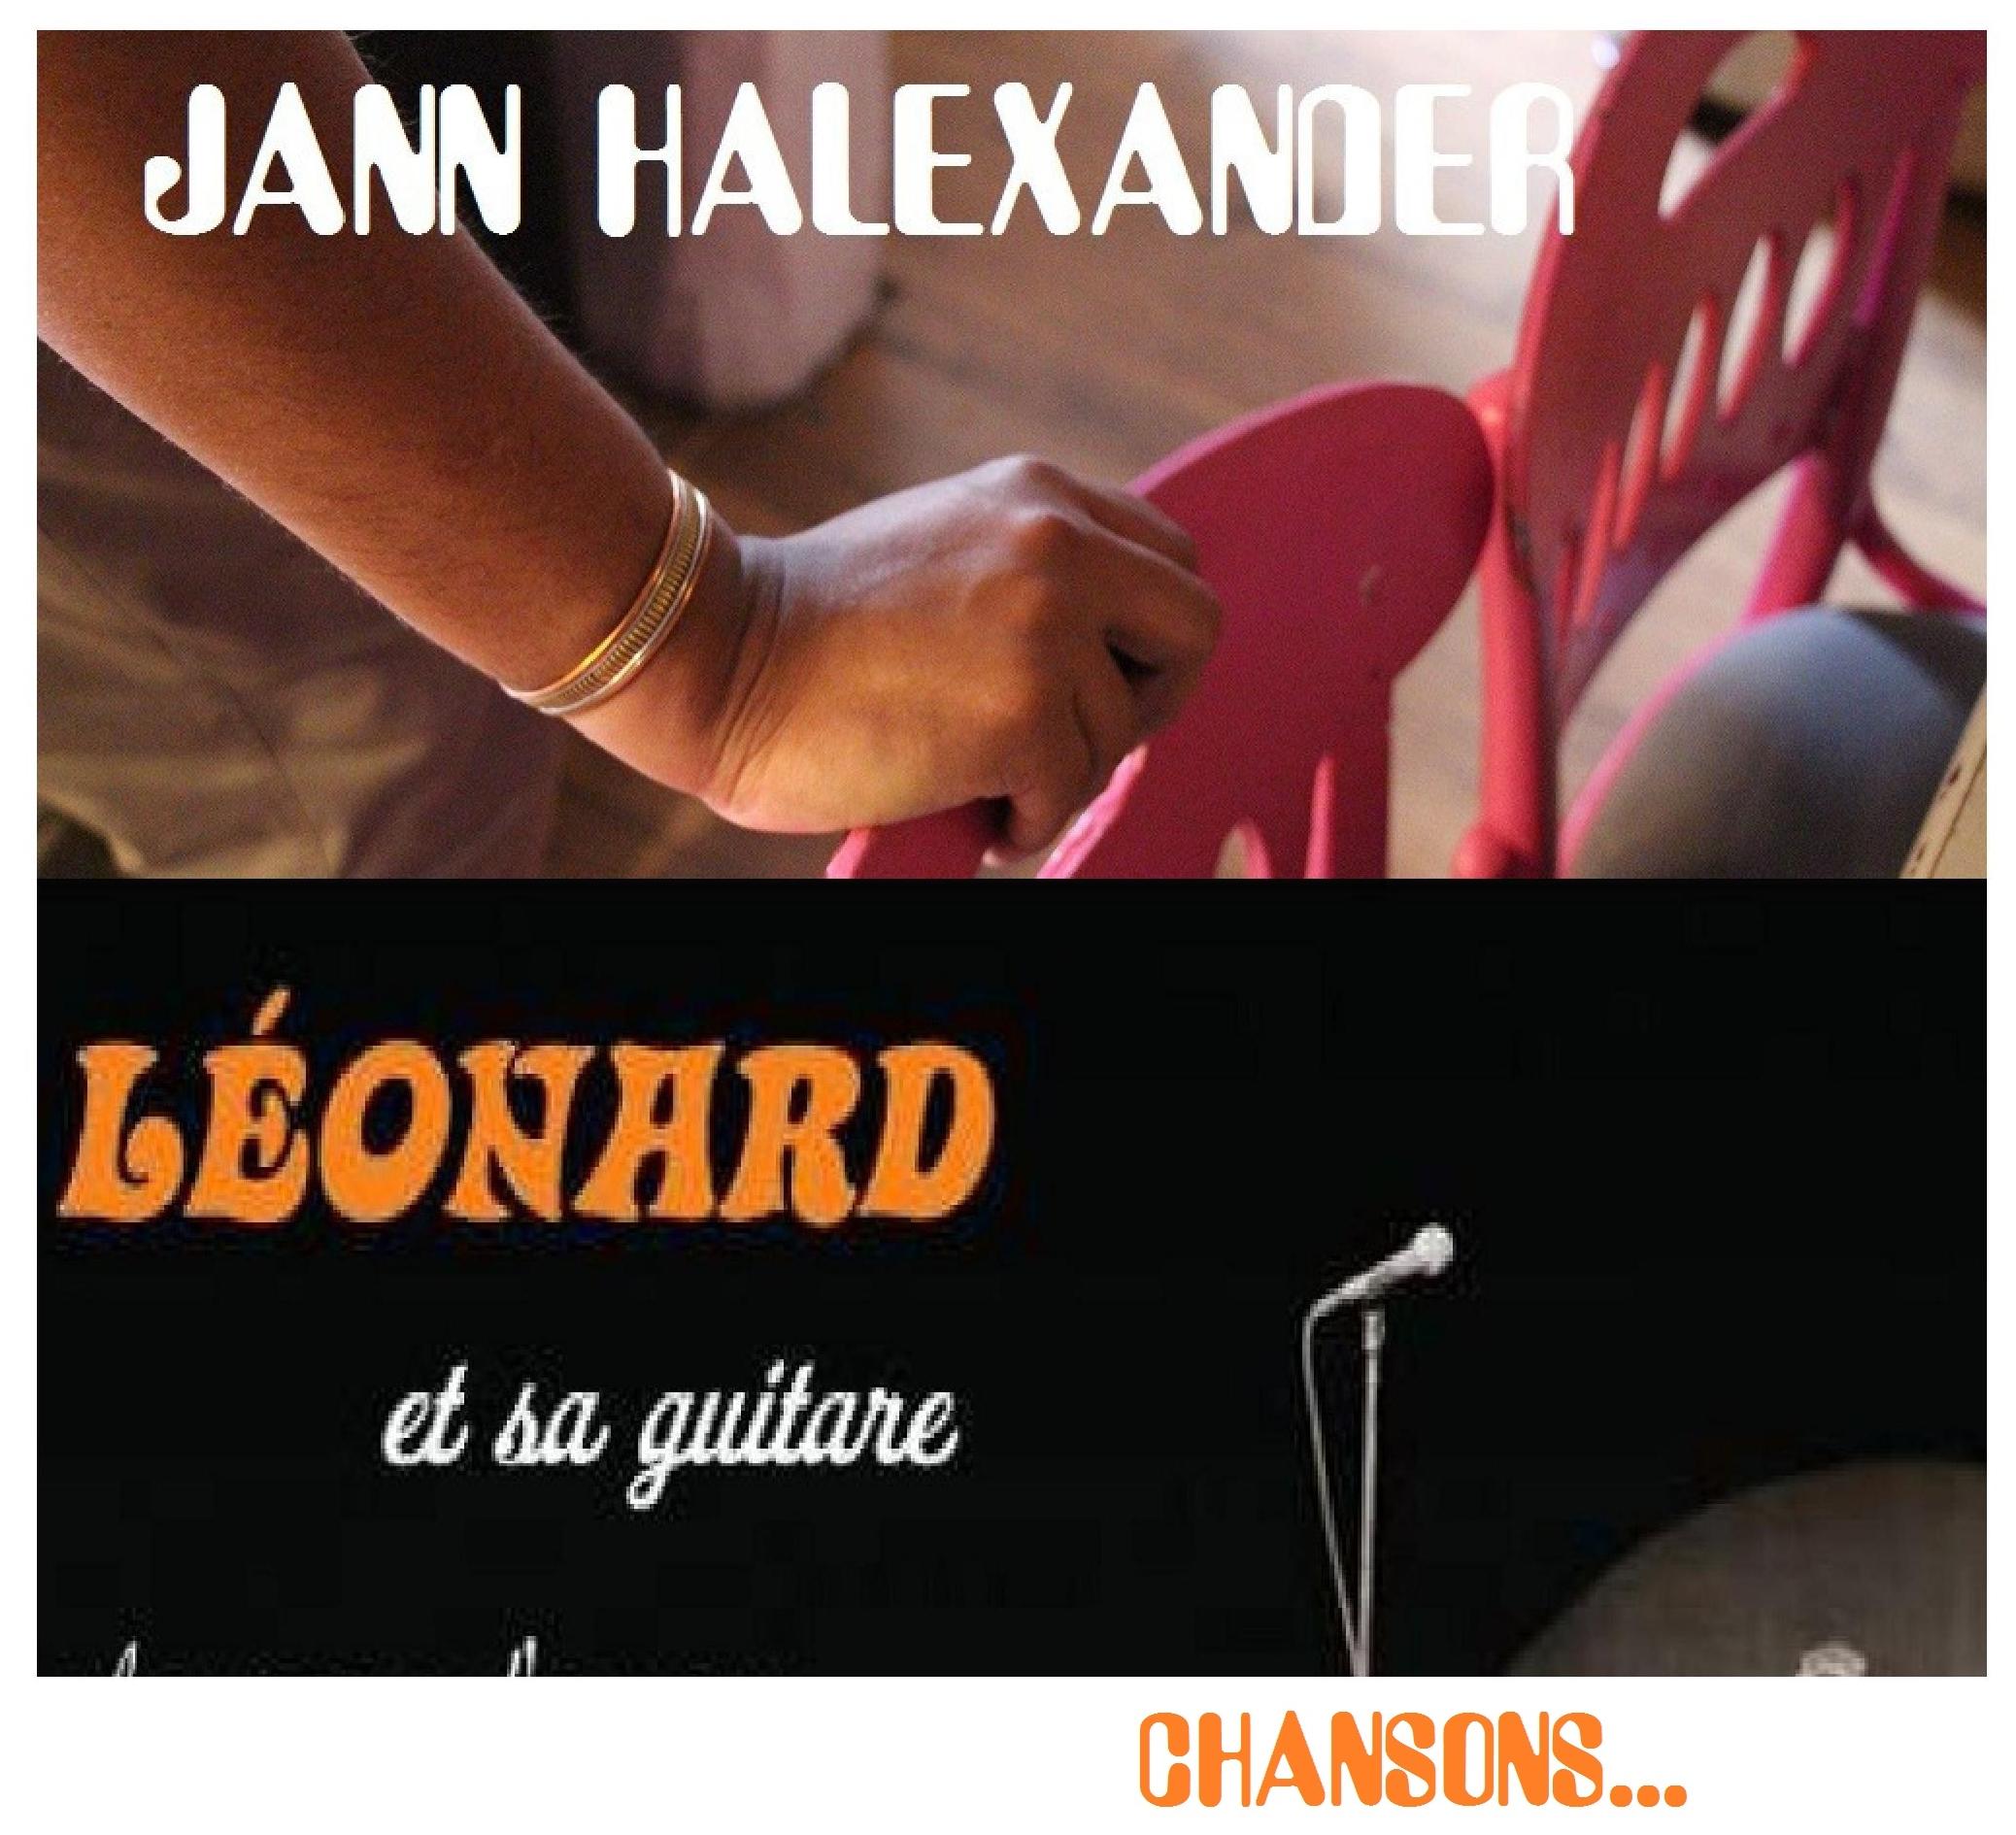 http://www.saphirnews.com/agenda/Jann-Halexander-Leonard-et-sa-guitare-CHANSONS_ae525808.html